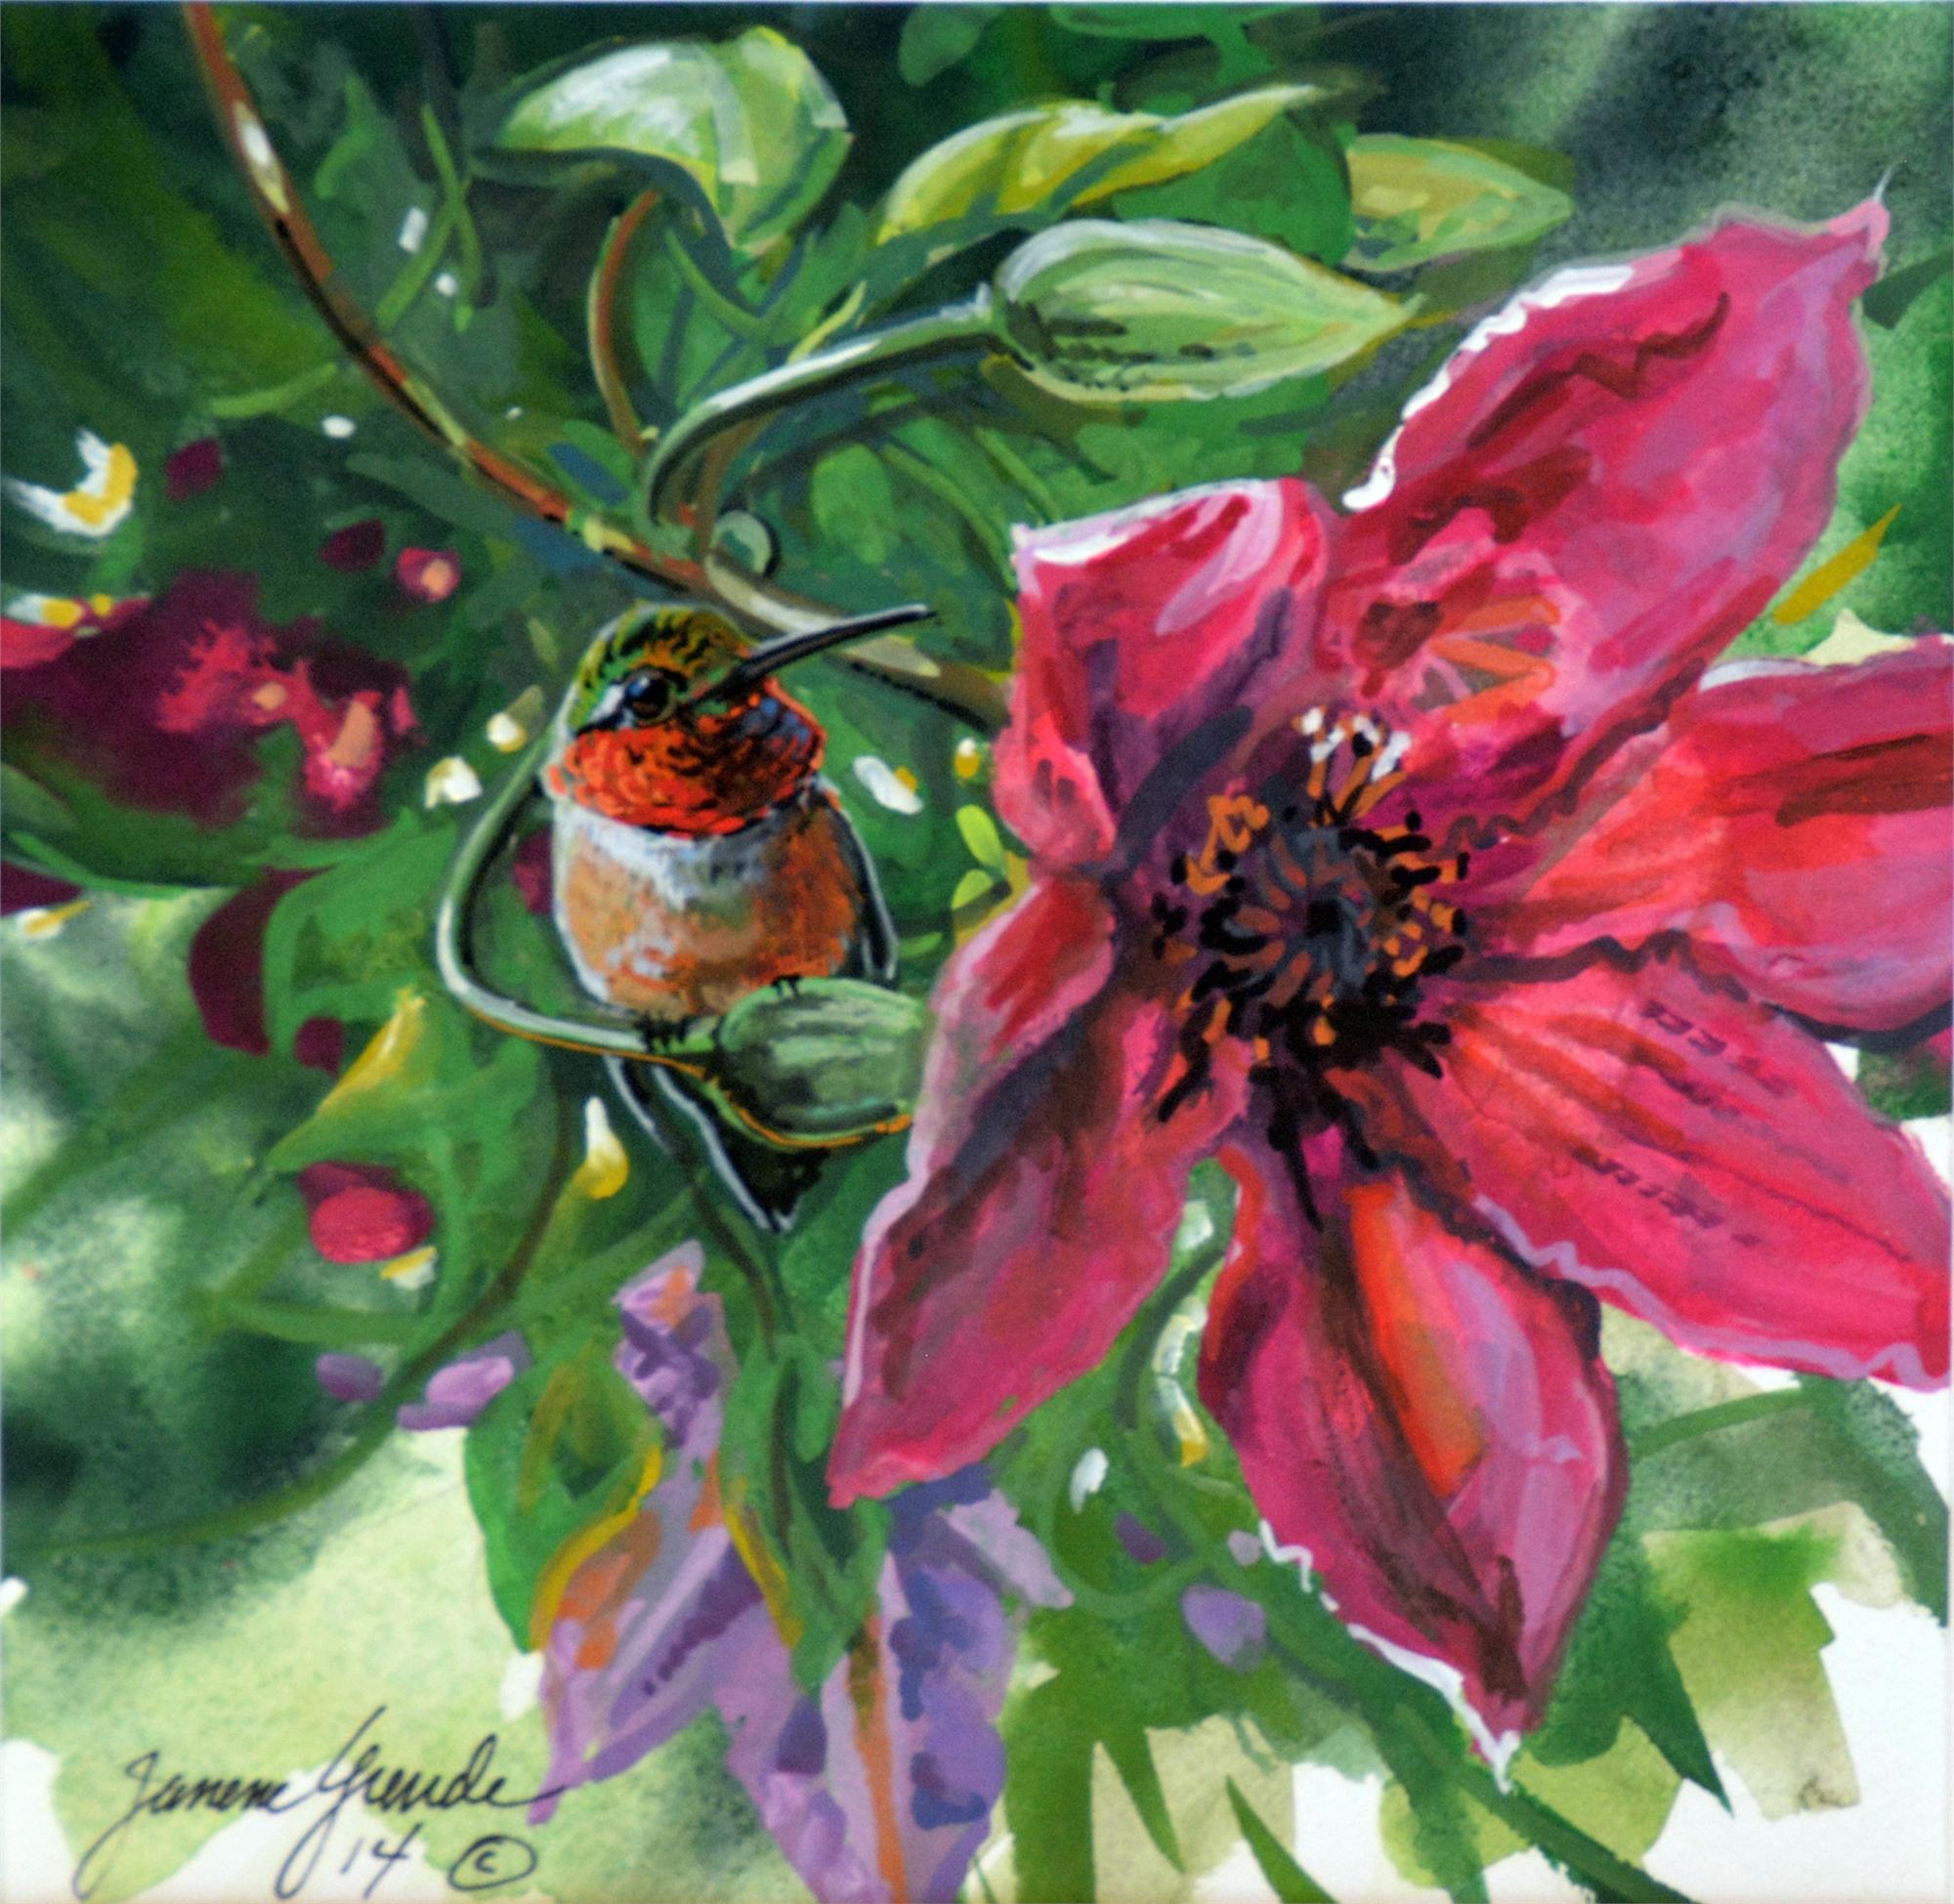 Garden Gem by Janene Grende